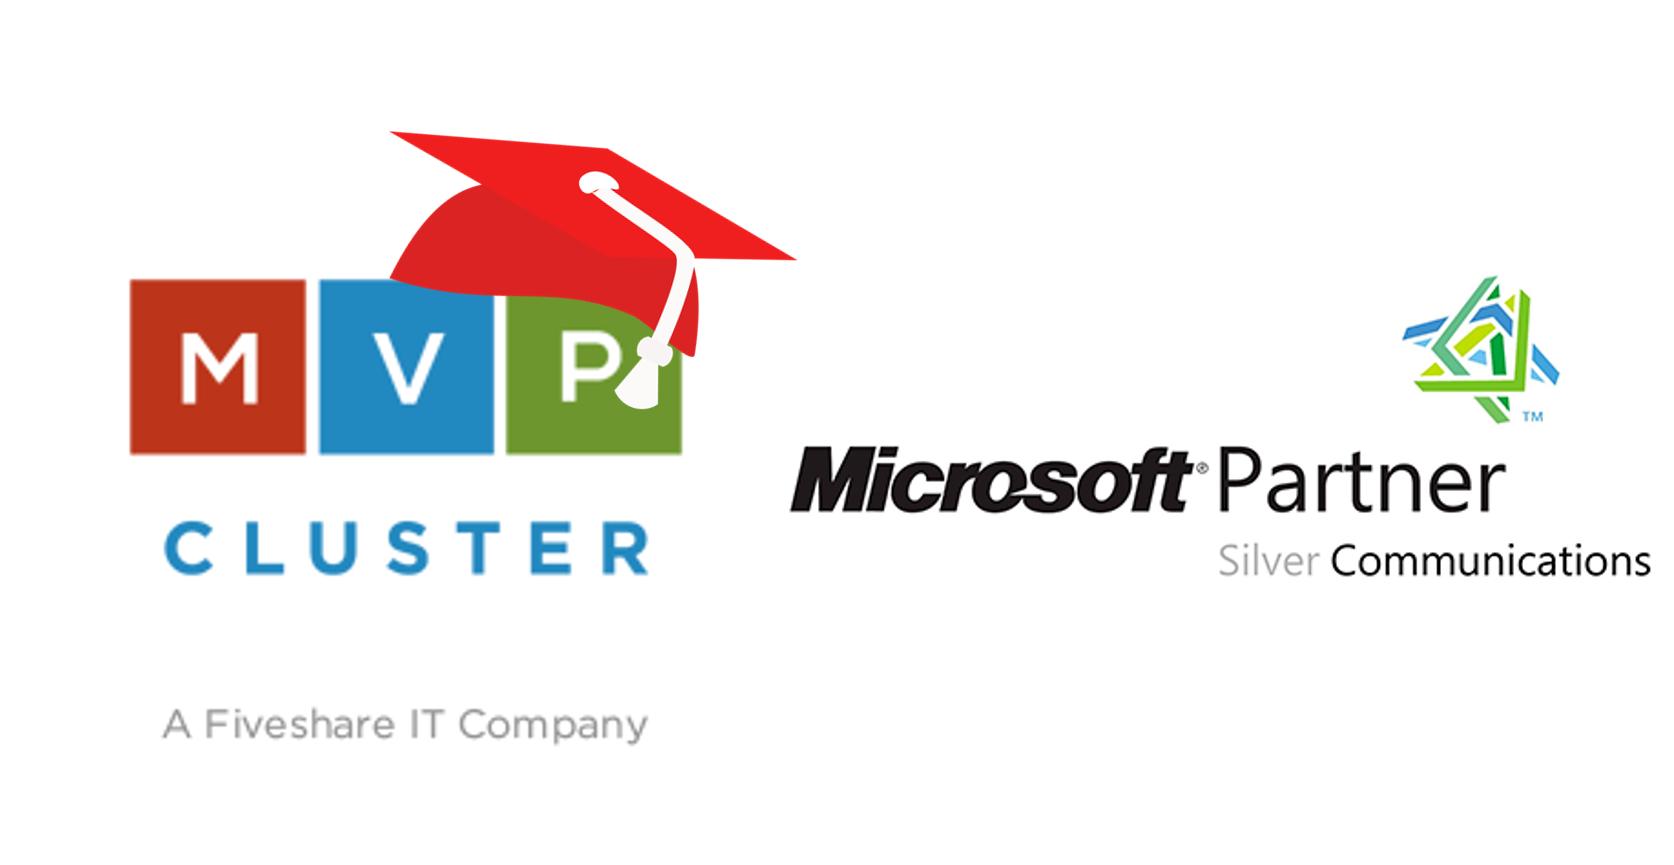 MVP CLUSTER ha conseguido la certificación como Microsoft Partner in Silver Communications.